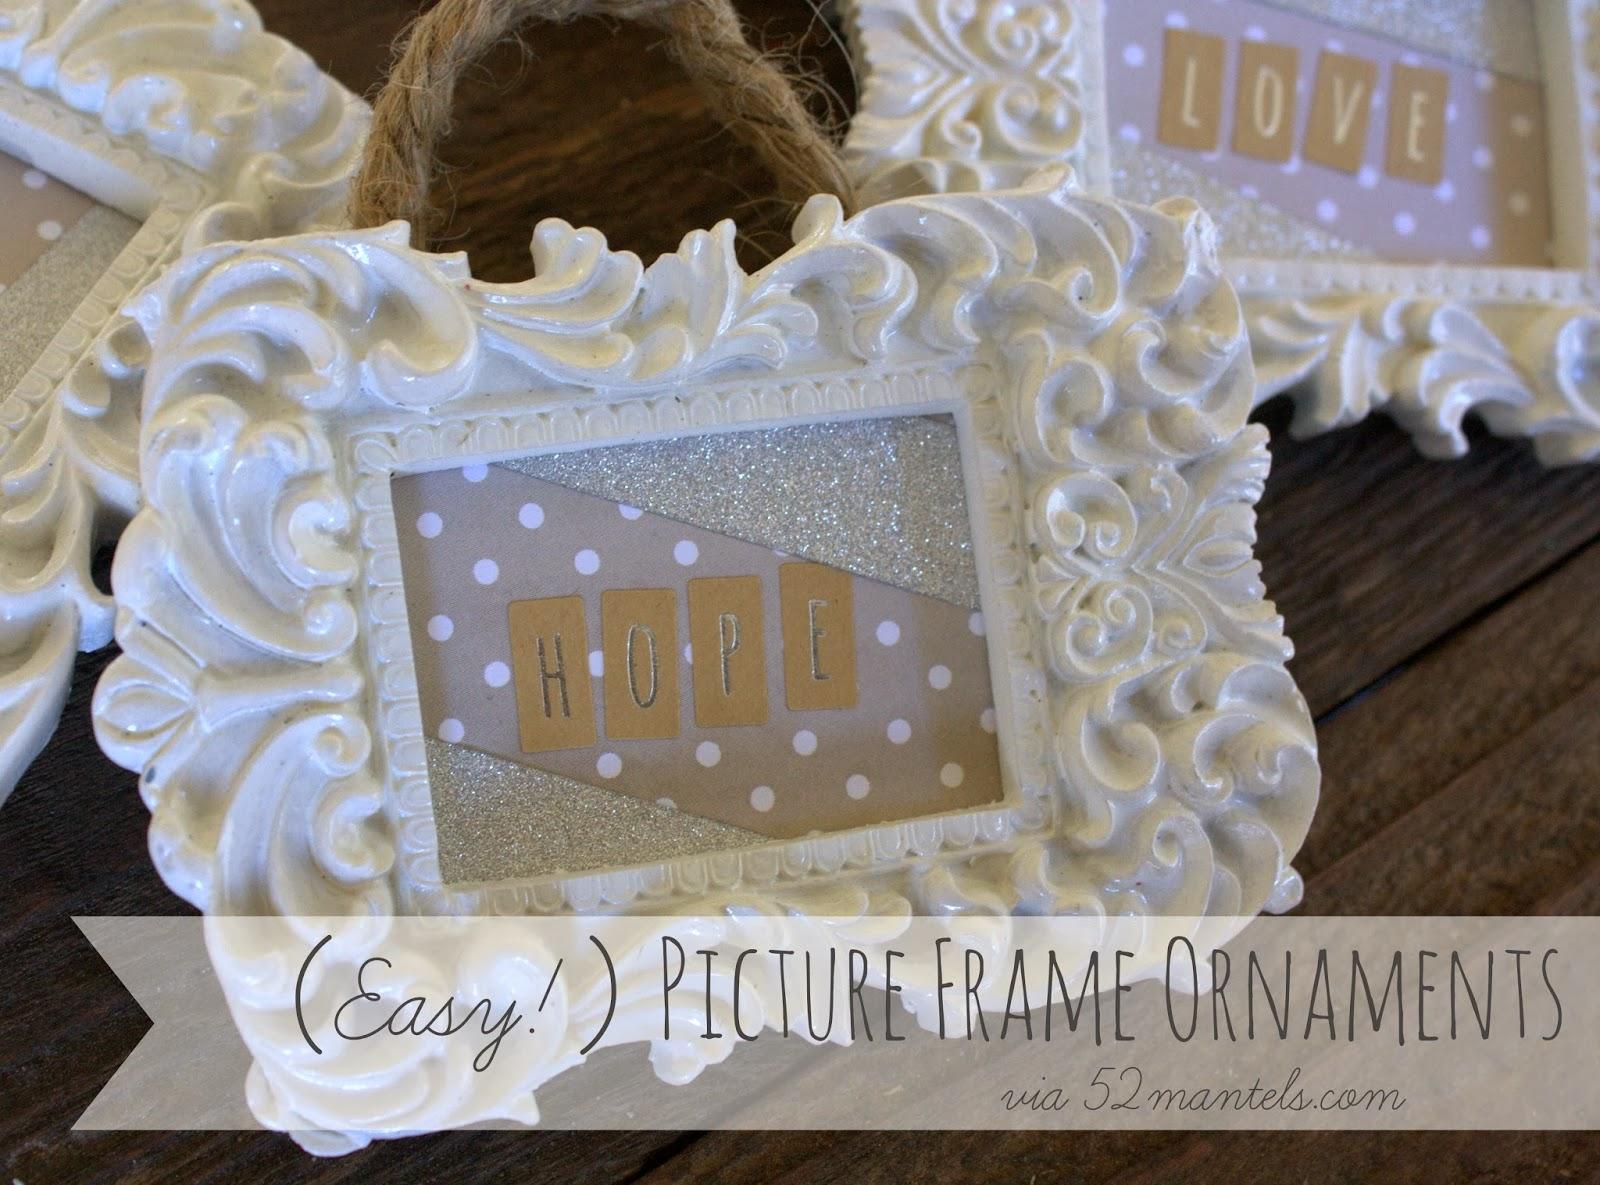 picture frame ornaments 52mantels.com